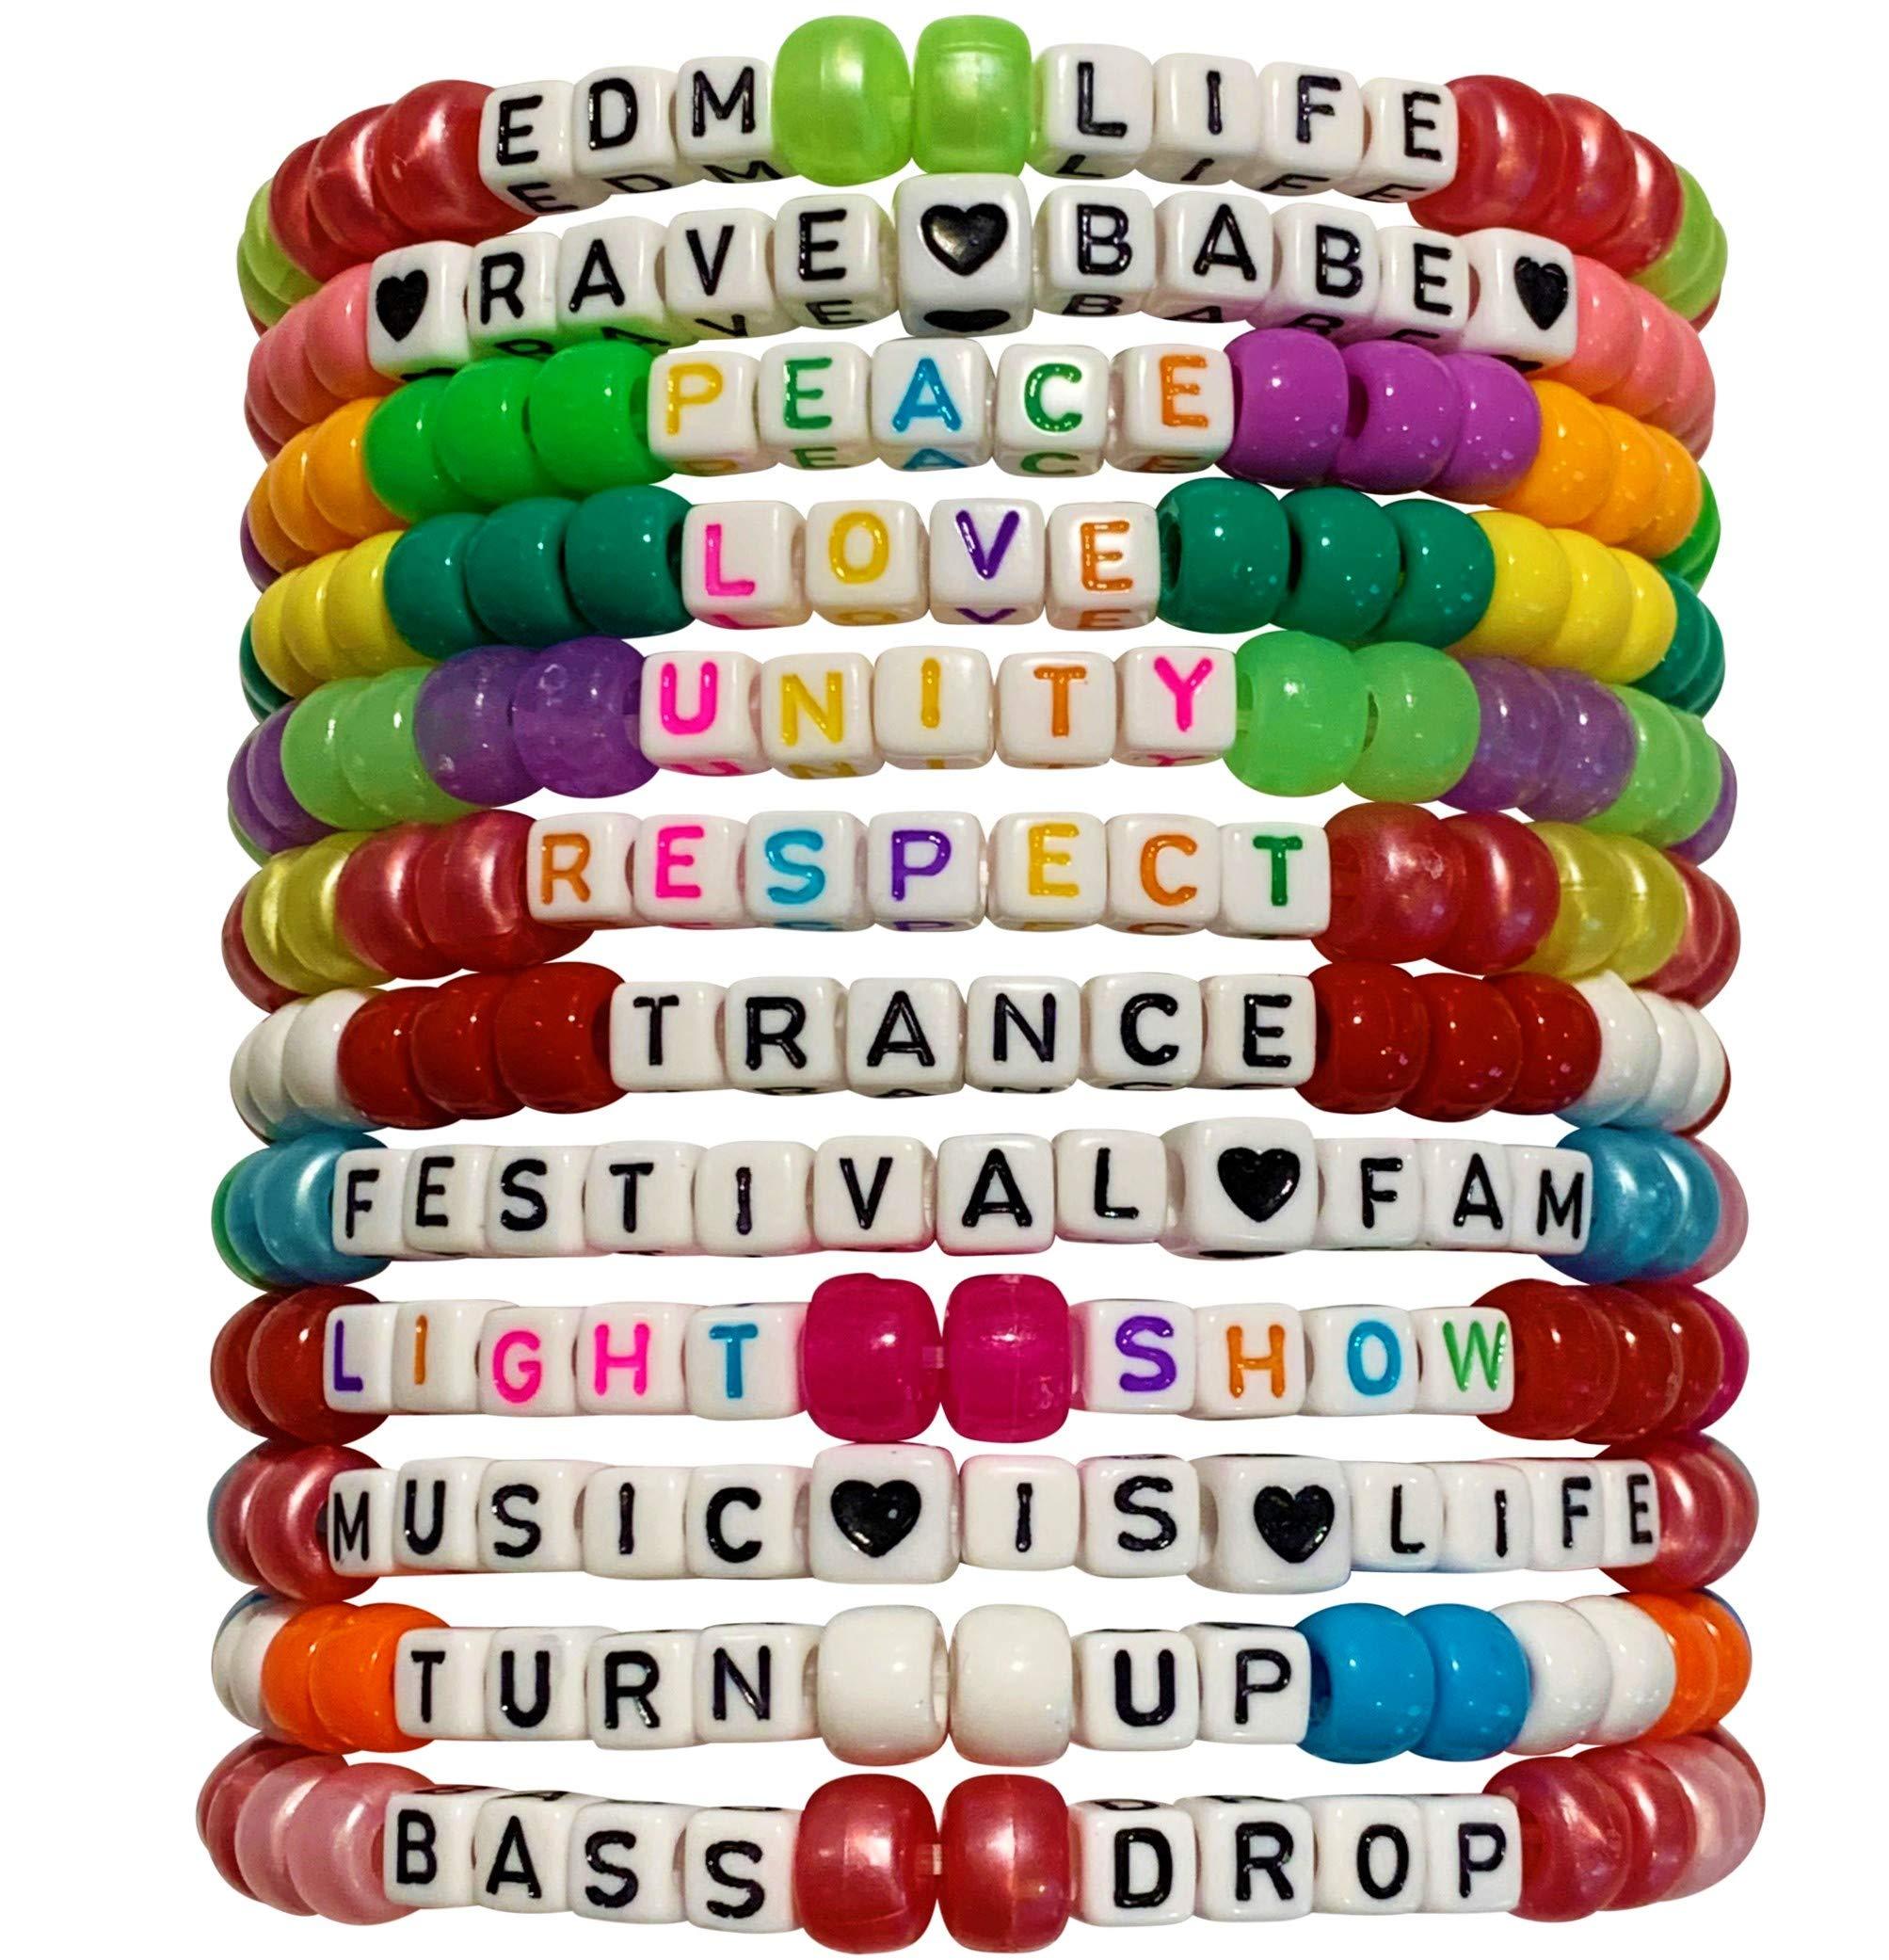 Handmade Kandi Bead Bracelets for Festivals, Parties, Raves, and More! (12-Pack) (EDM)